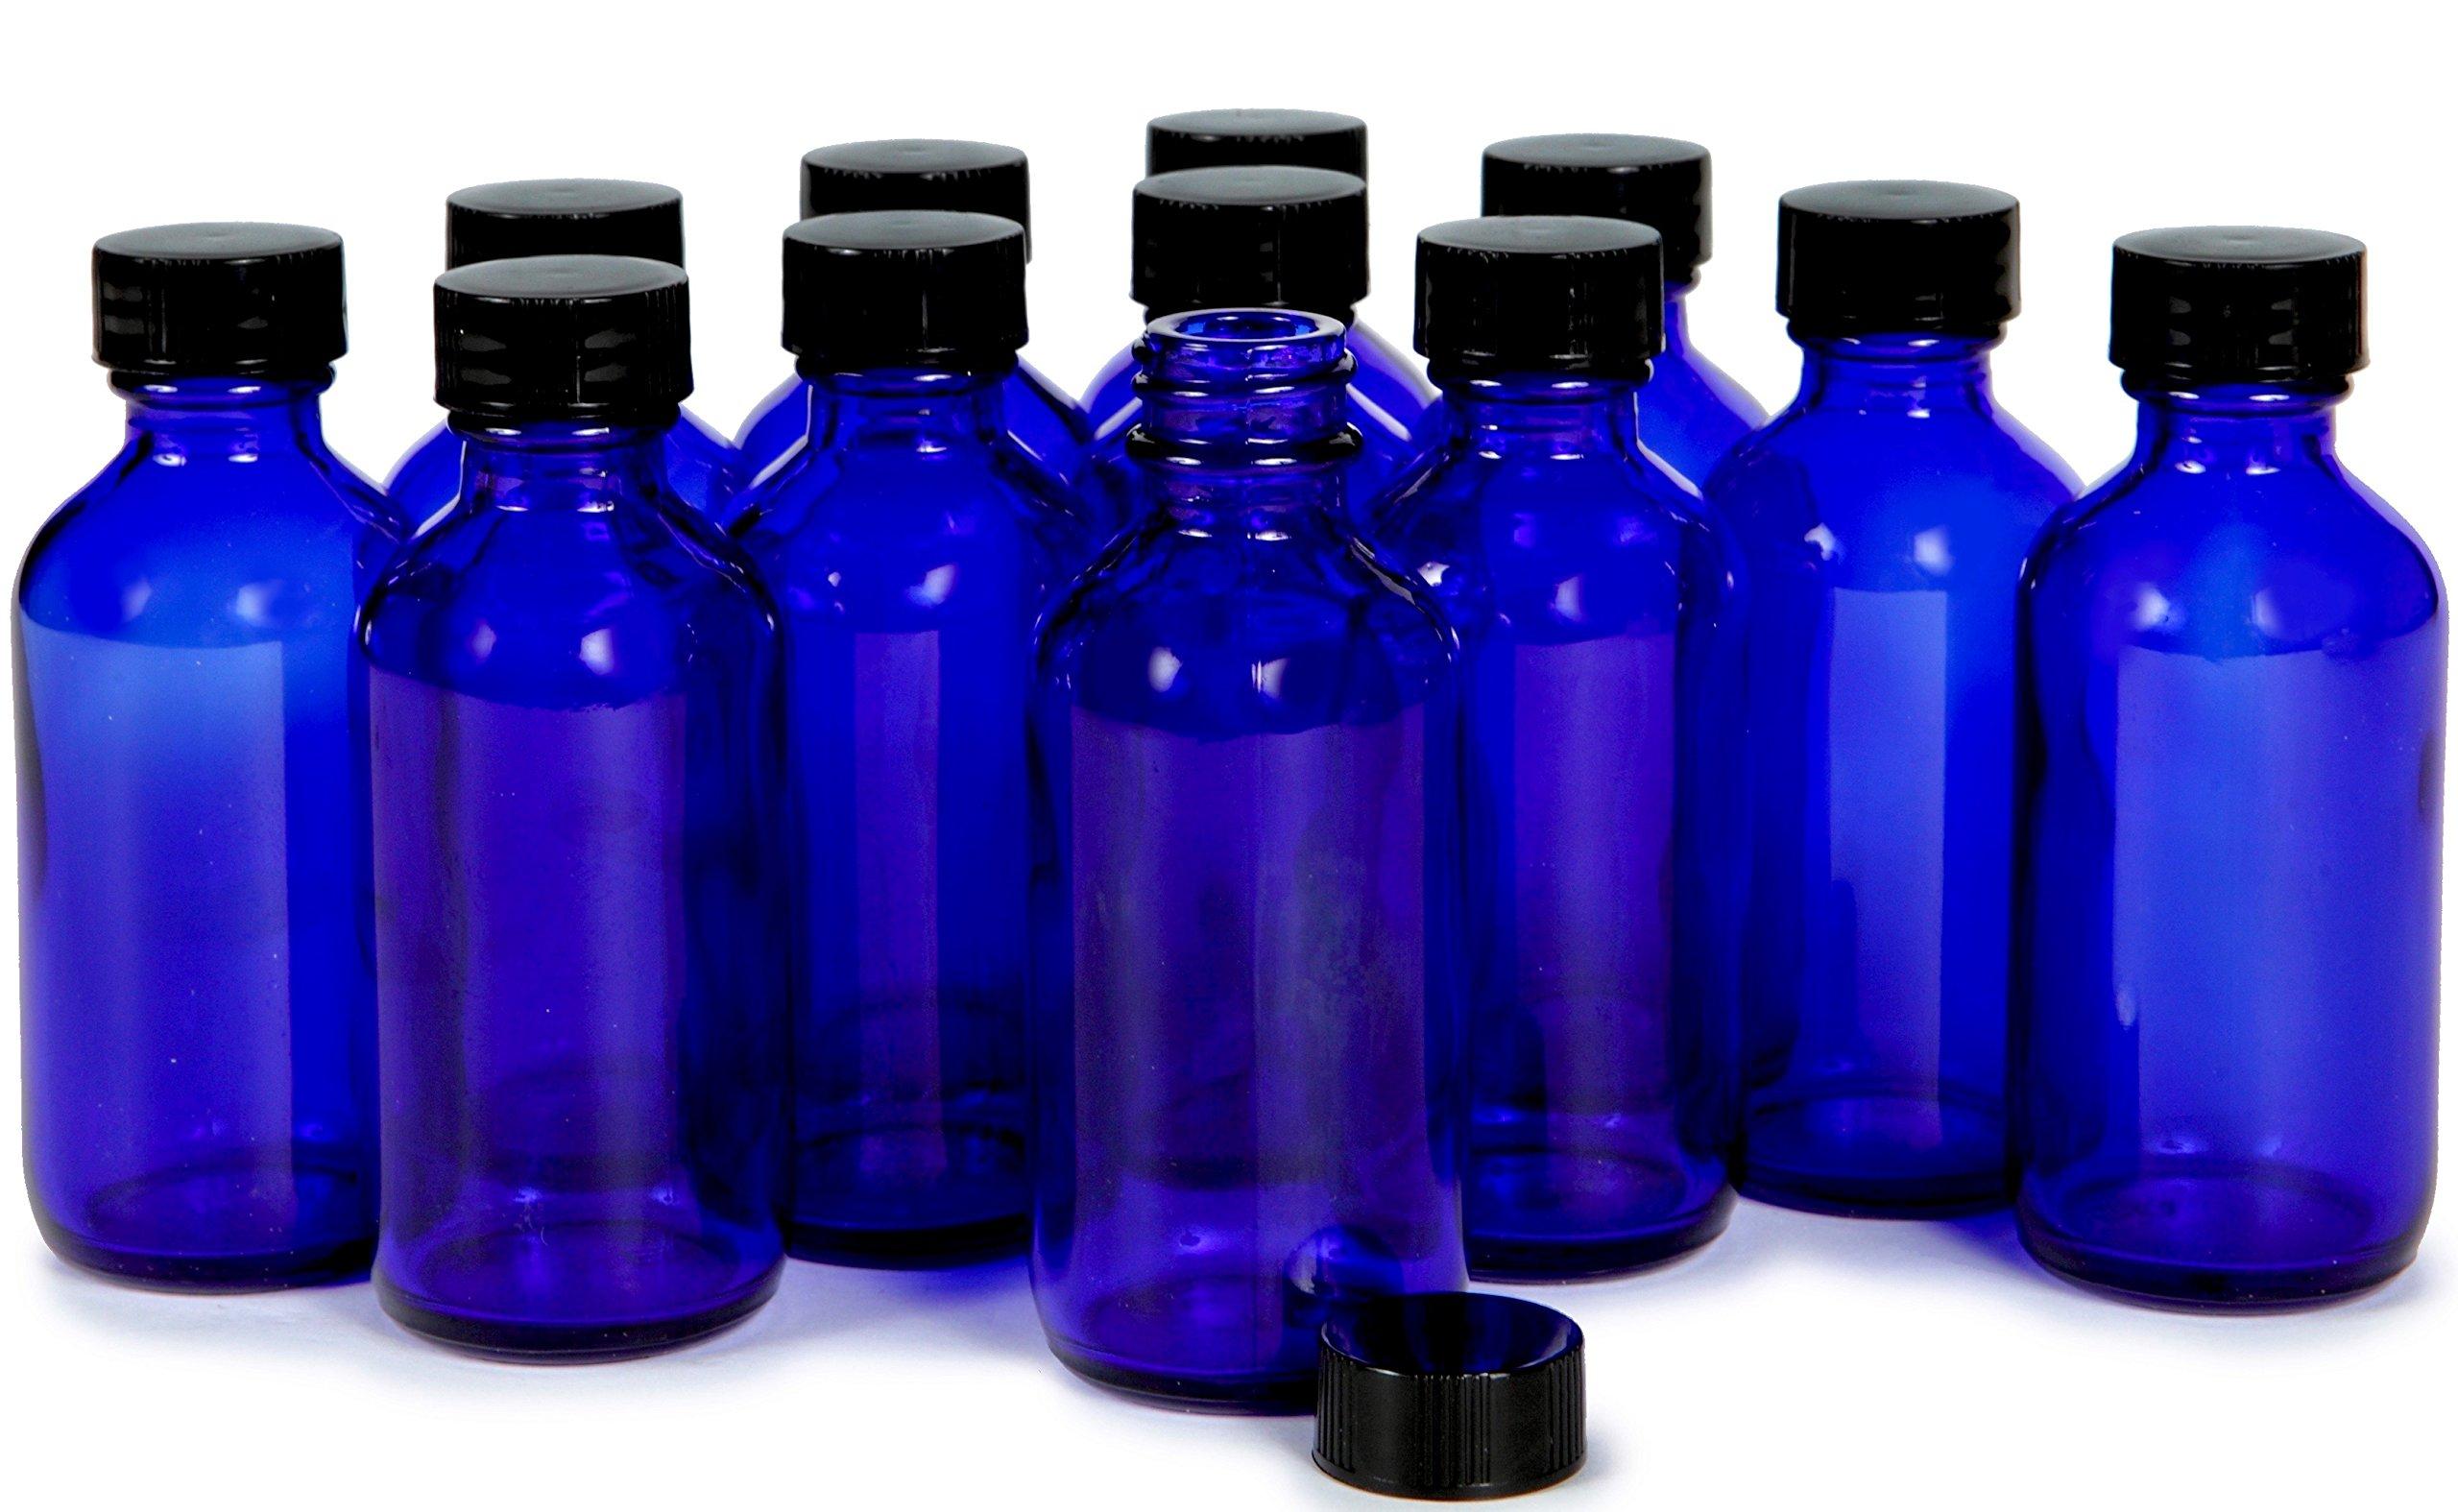 vivaplex 12 amber 2 oz glass bottles with lids beauty. Black Bedroom Furniture Sets. Home Design Ideas